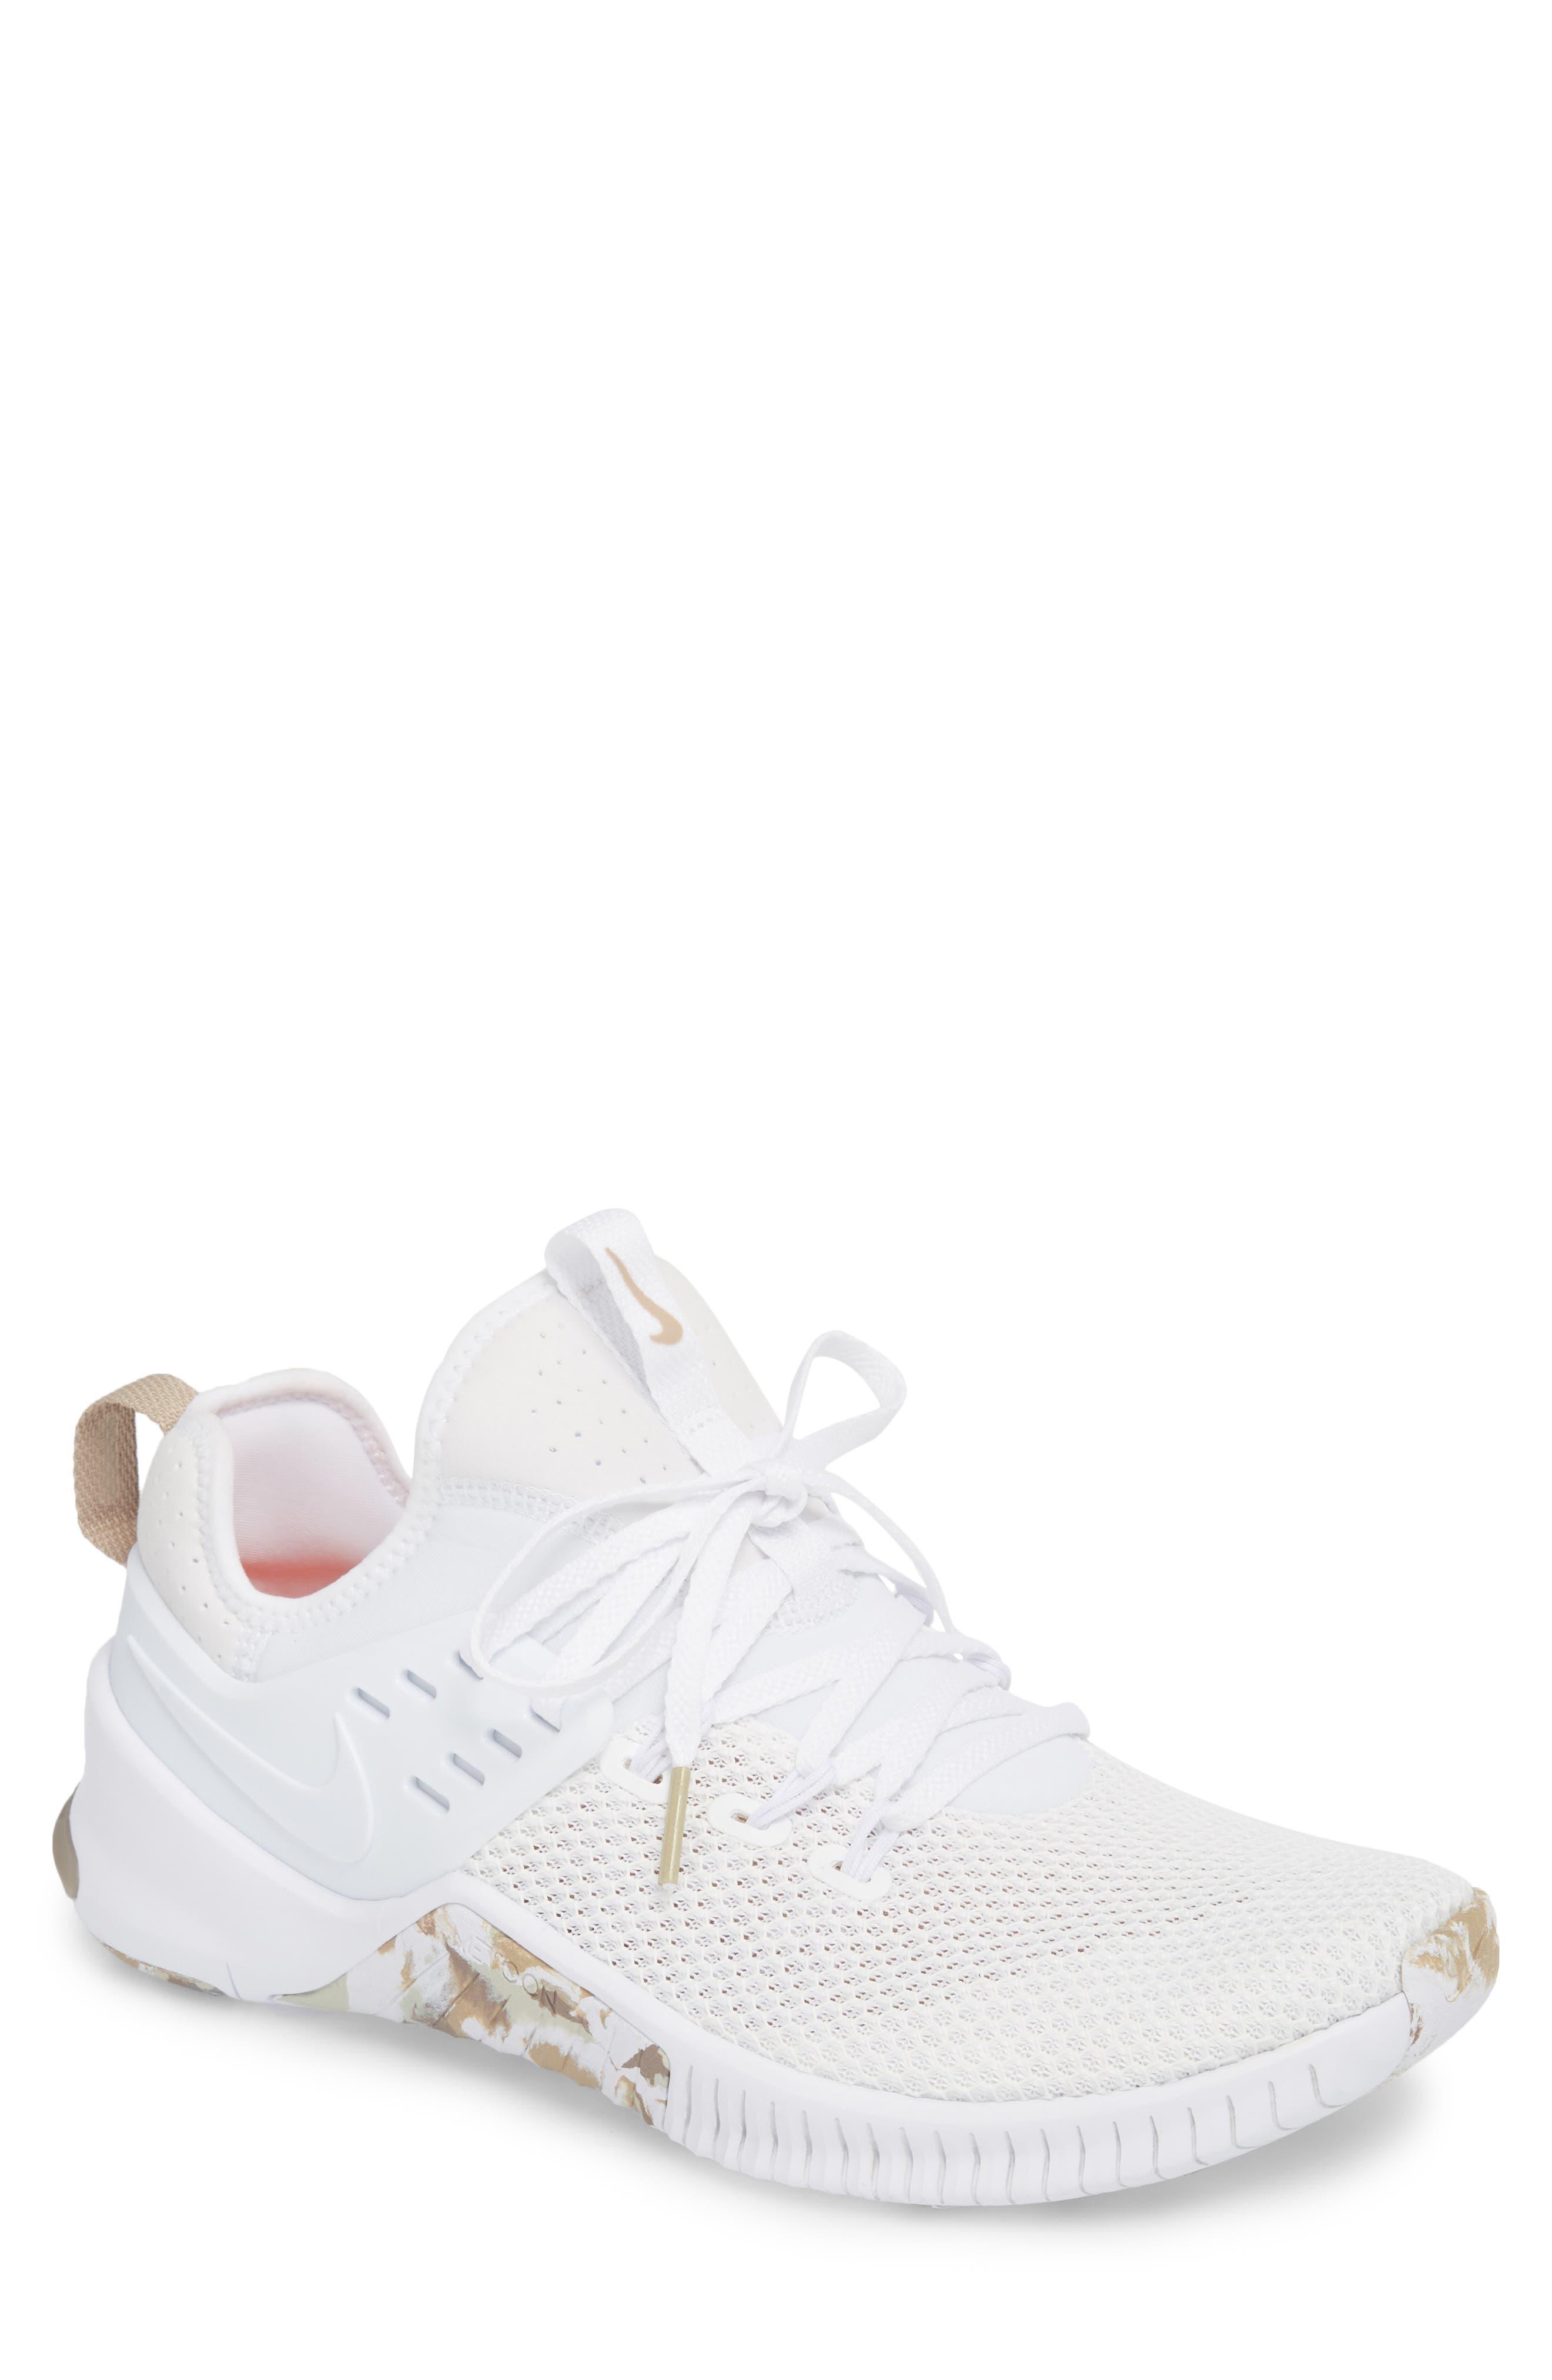 Nike Free X  Metcon Training Zapato Blanco  X Negro Modesens 7f5d38